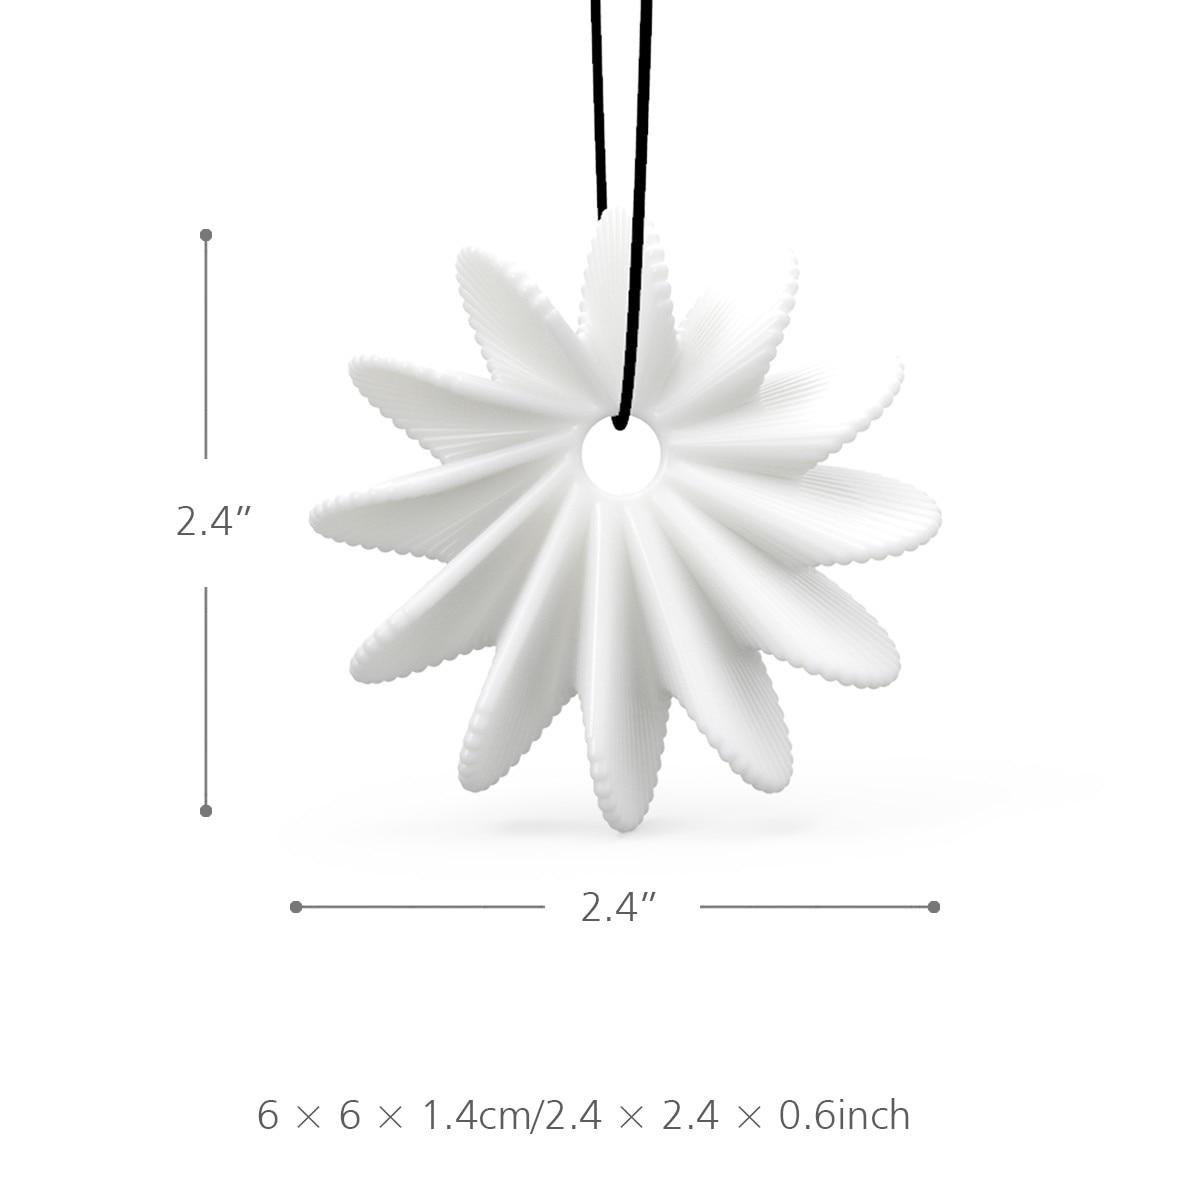 Tooarts Tomfeel 3D 인쇄 보석 개화 꽃 우아한 모델링 - 가정 장식 - 사진 4